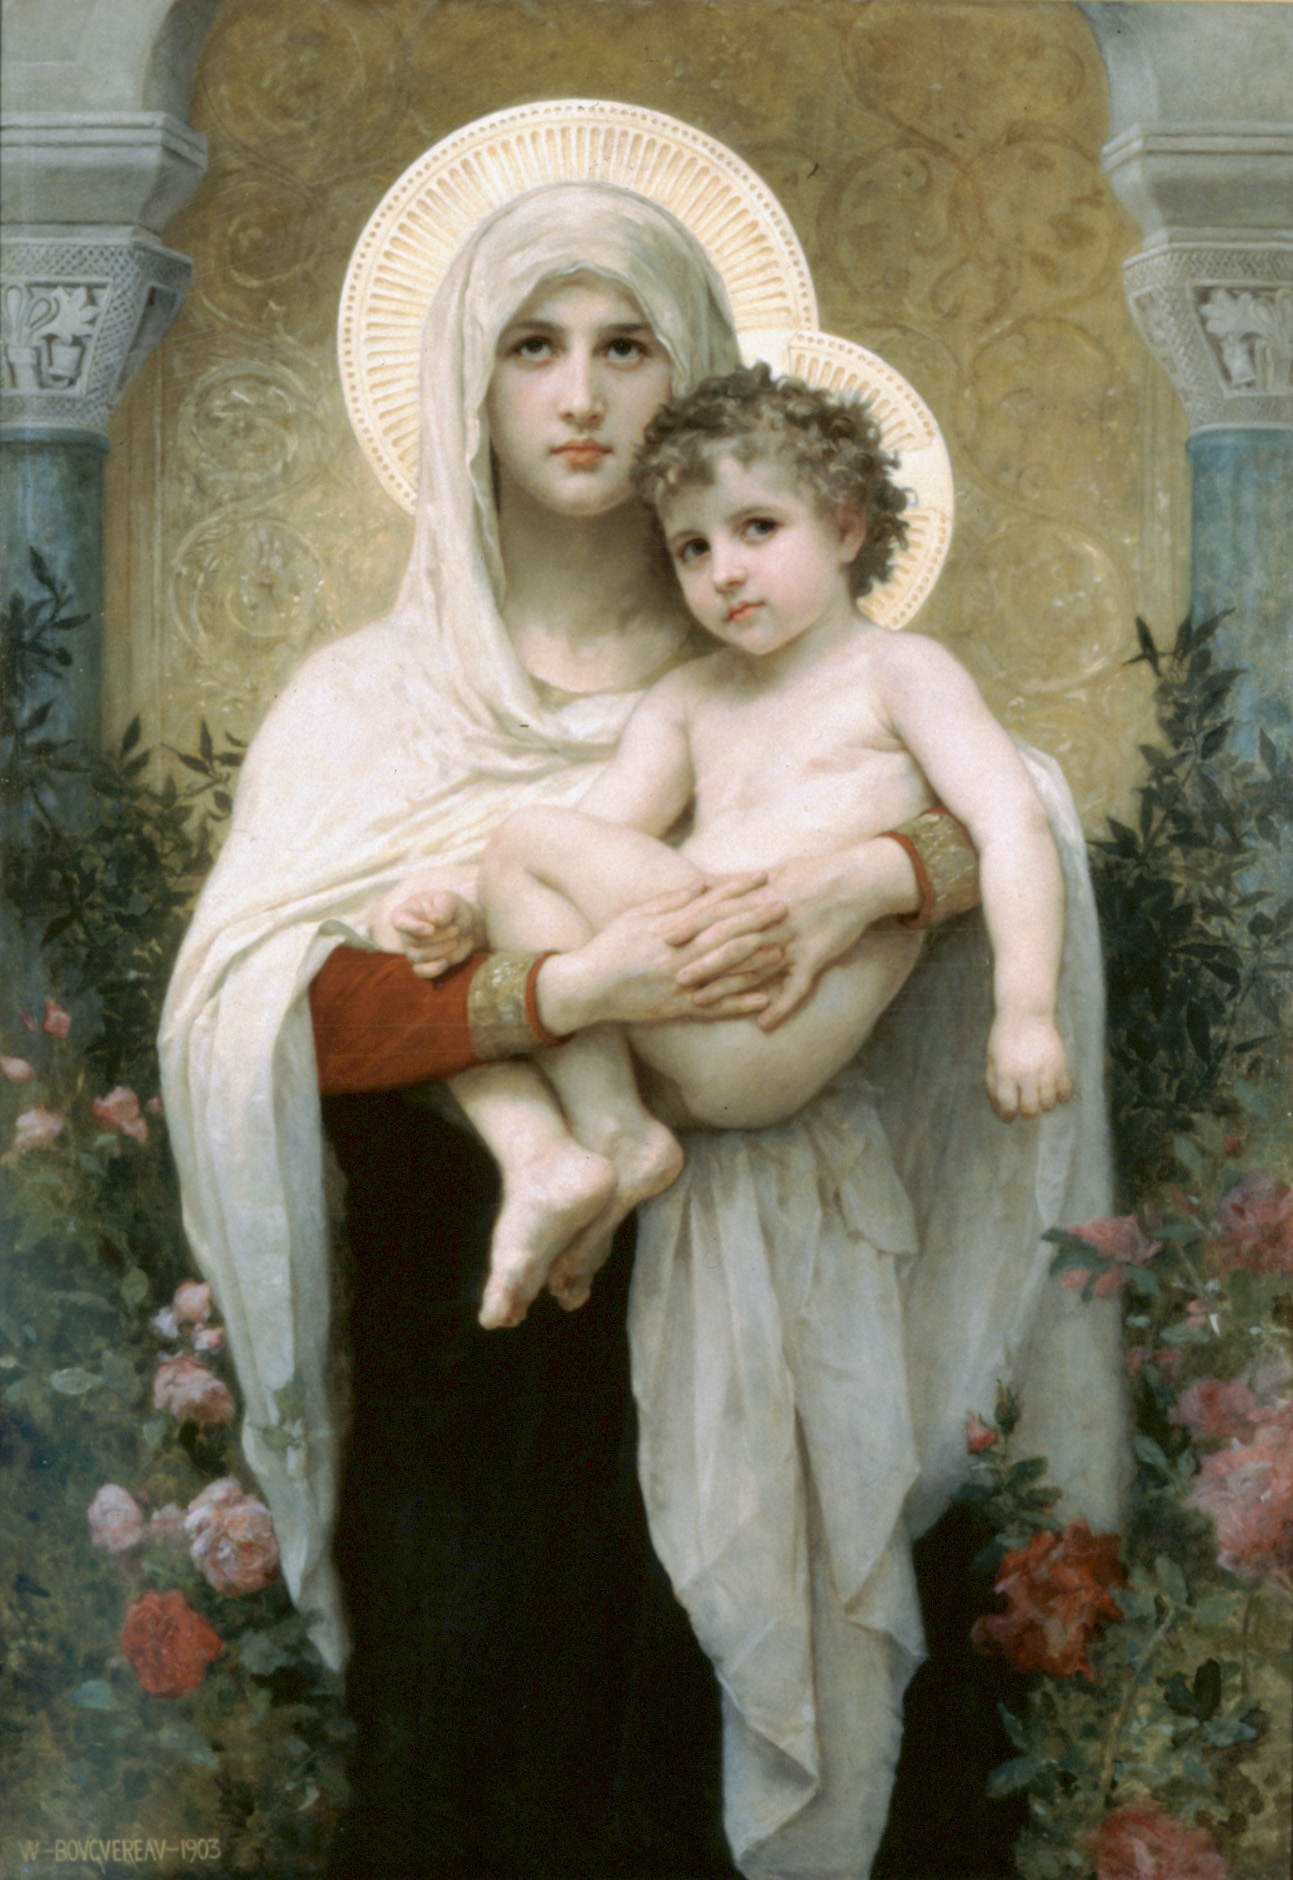 Saint bernard the blessed virgin mary